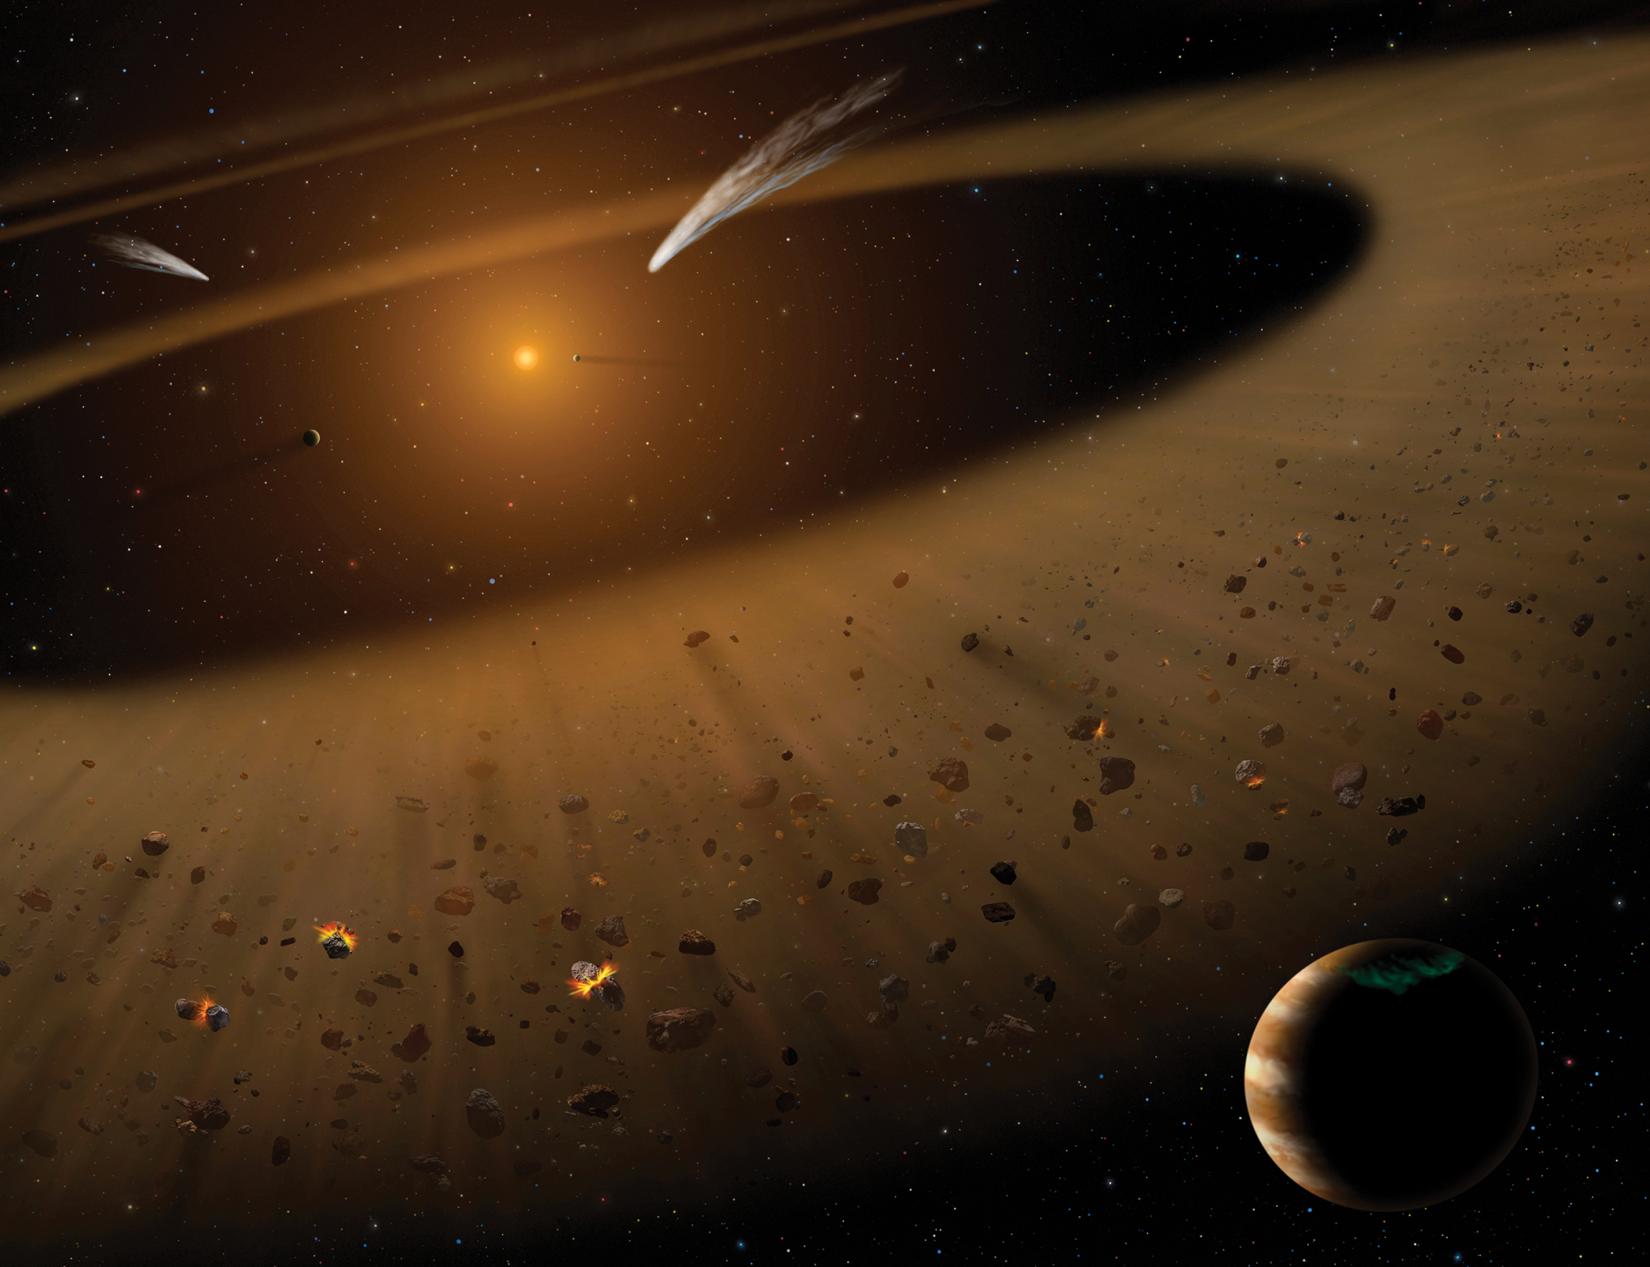 Artist's impression of the Epsilon Eridani system